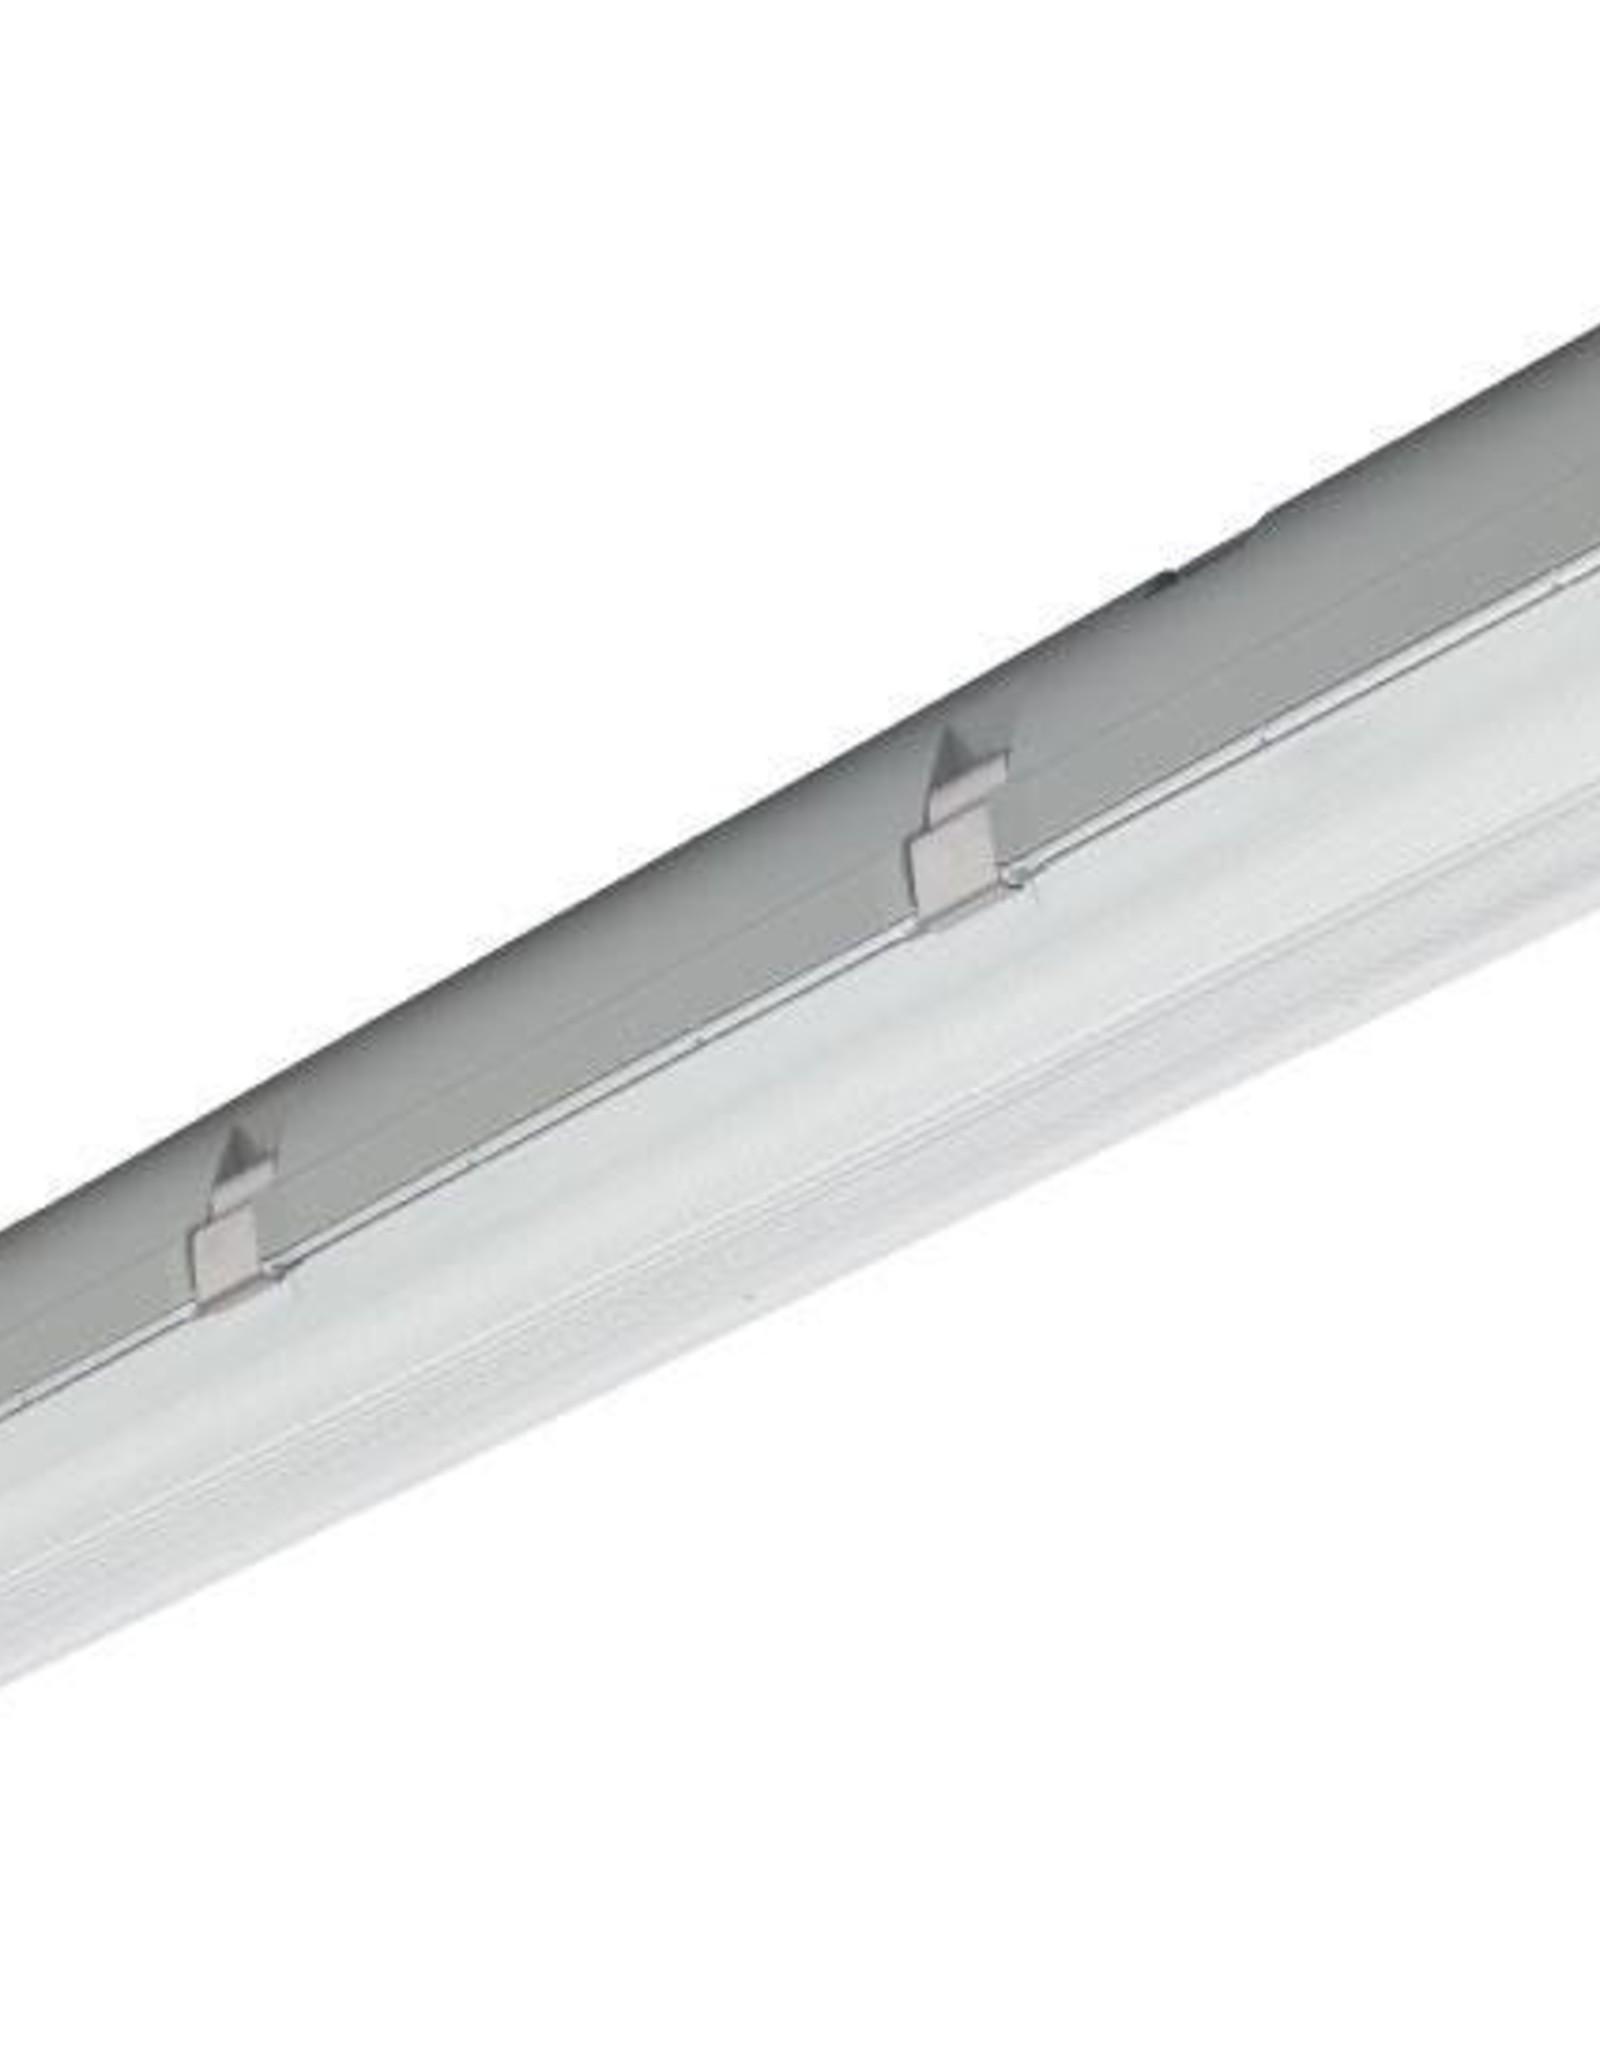 Prima 2x58W - ABS - inox clips - HF ballast